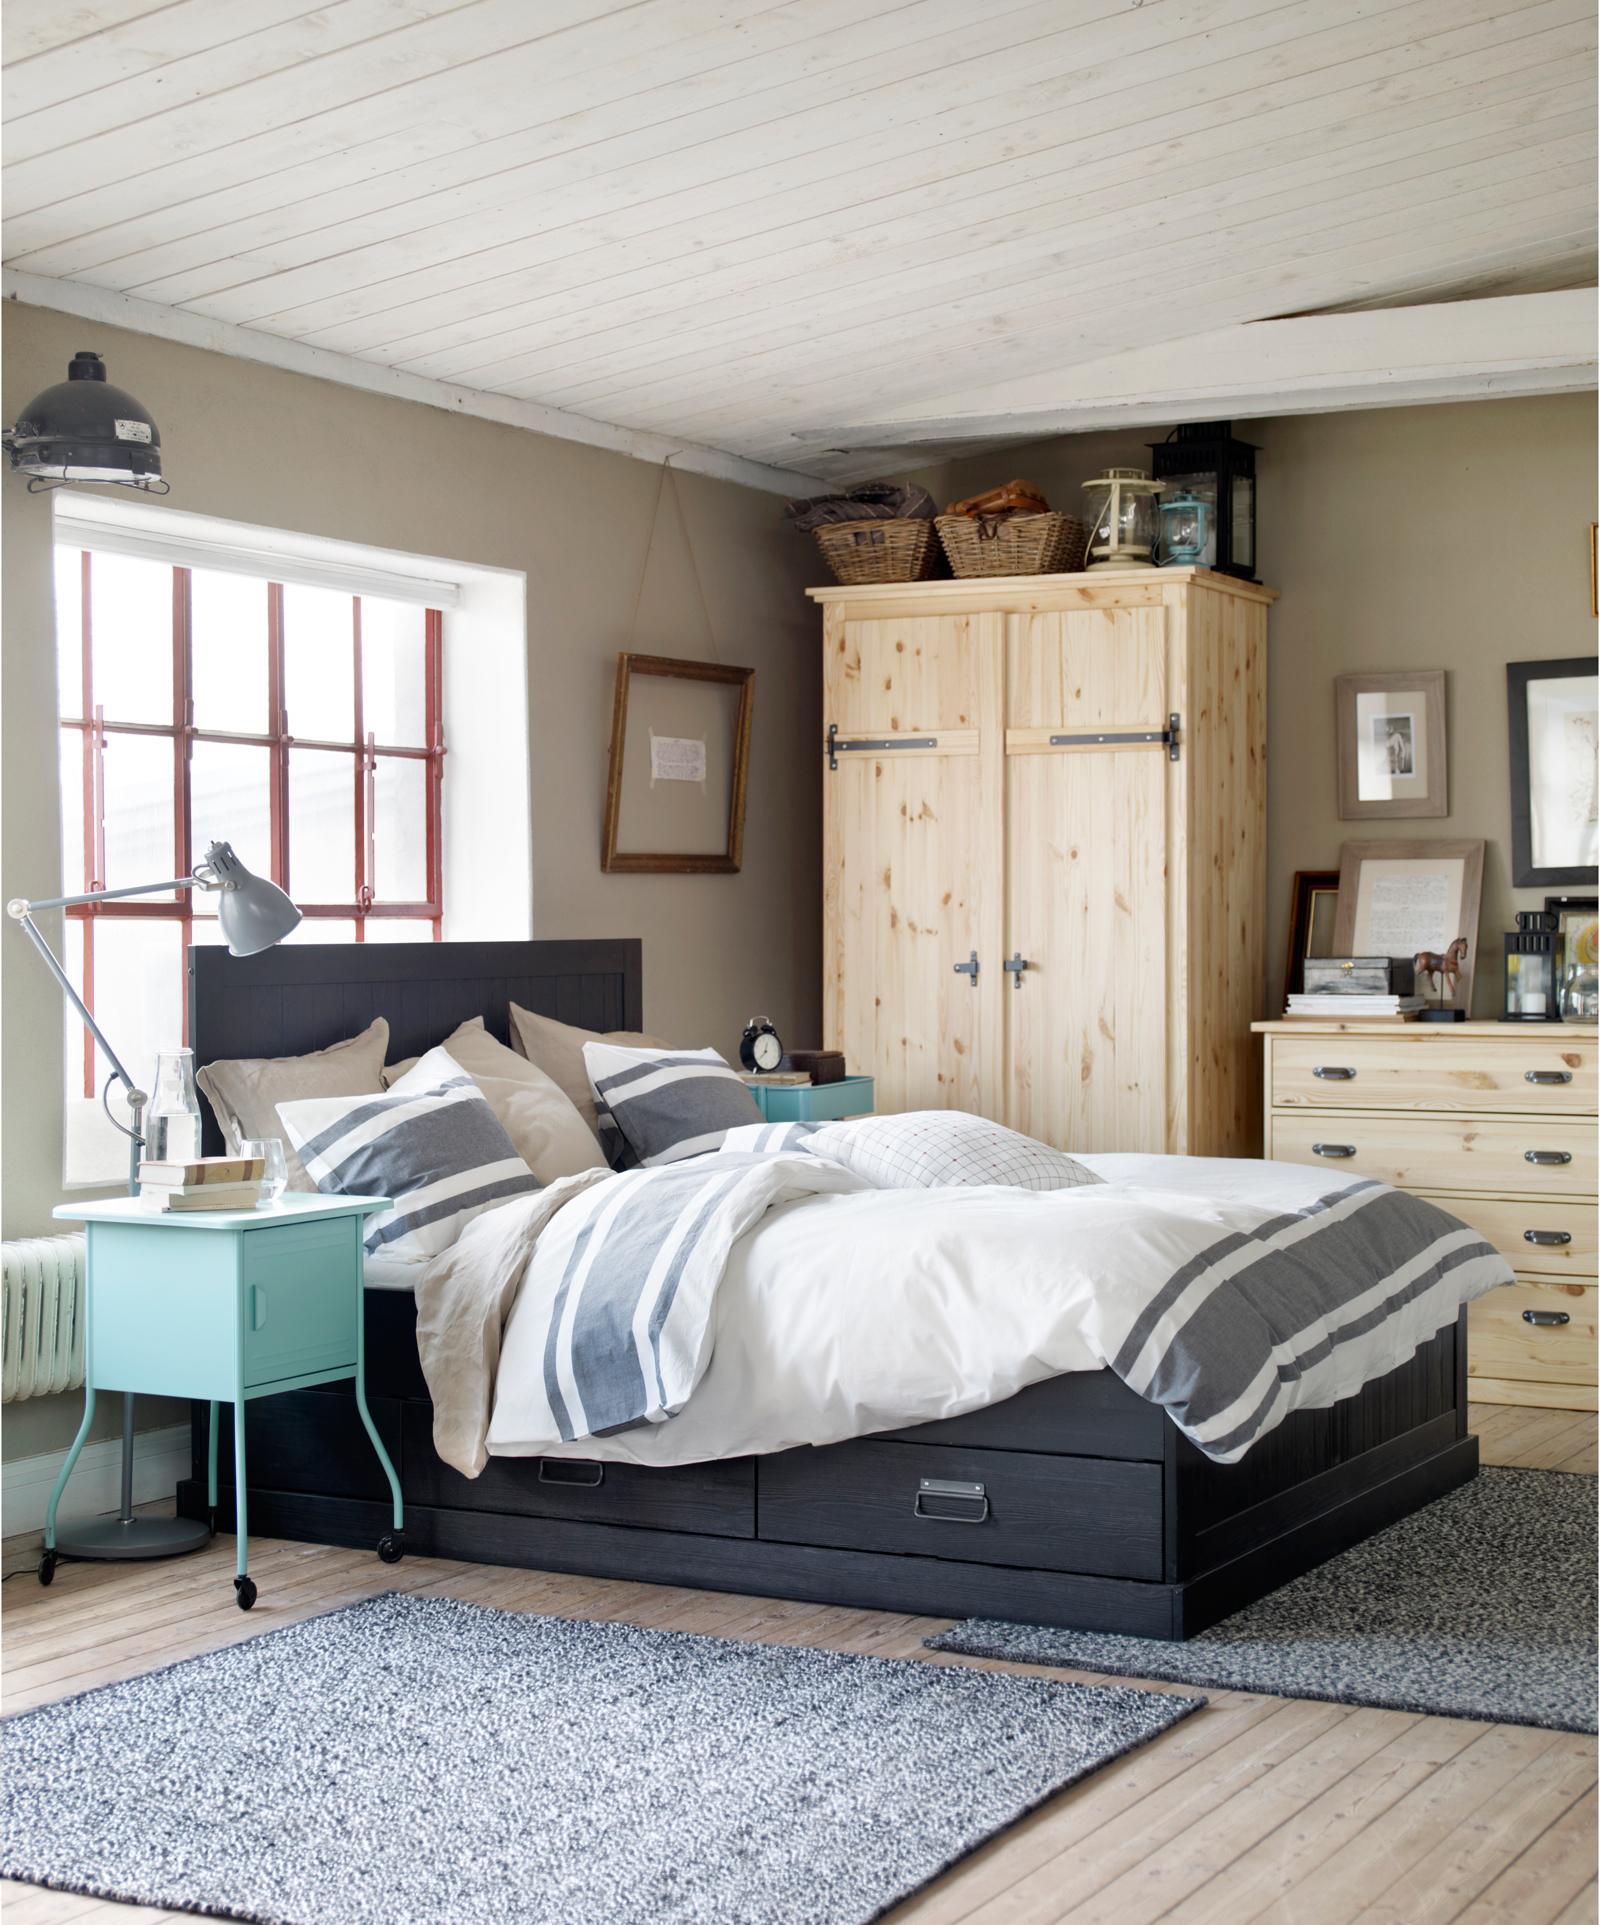 wei e holzbalkendecke bilder ideen couch. Black Bedroom Furniture Sets. Home Design Ideas